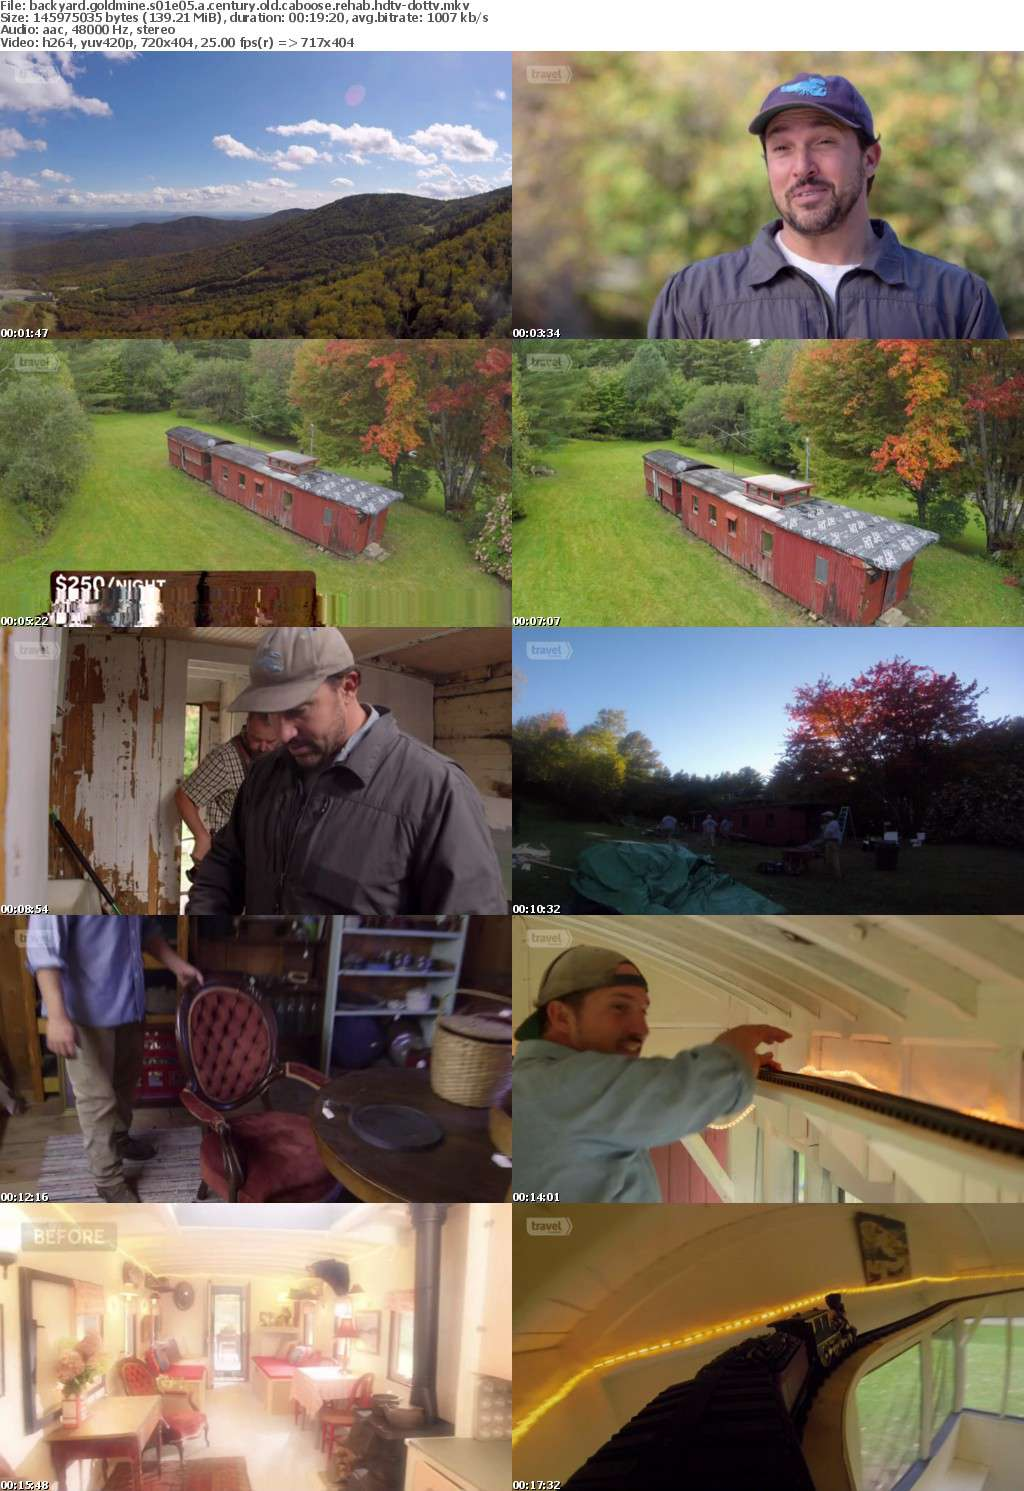 Backyard Goldmine S01E05 A Century Old Caboose Rehab HDTV x264-dotTV